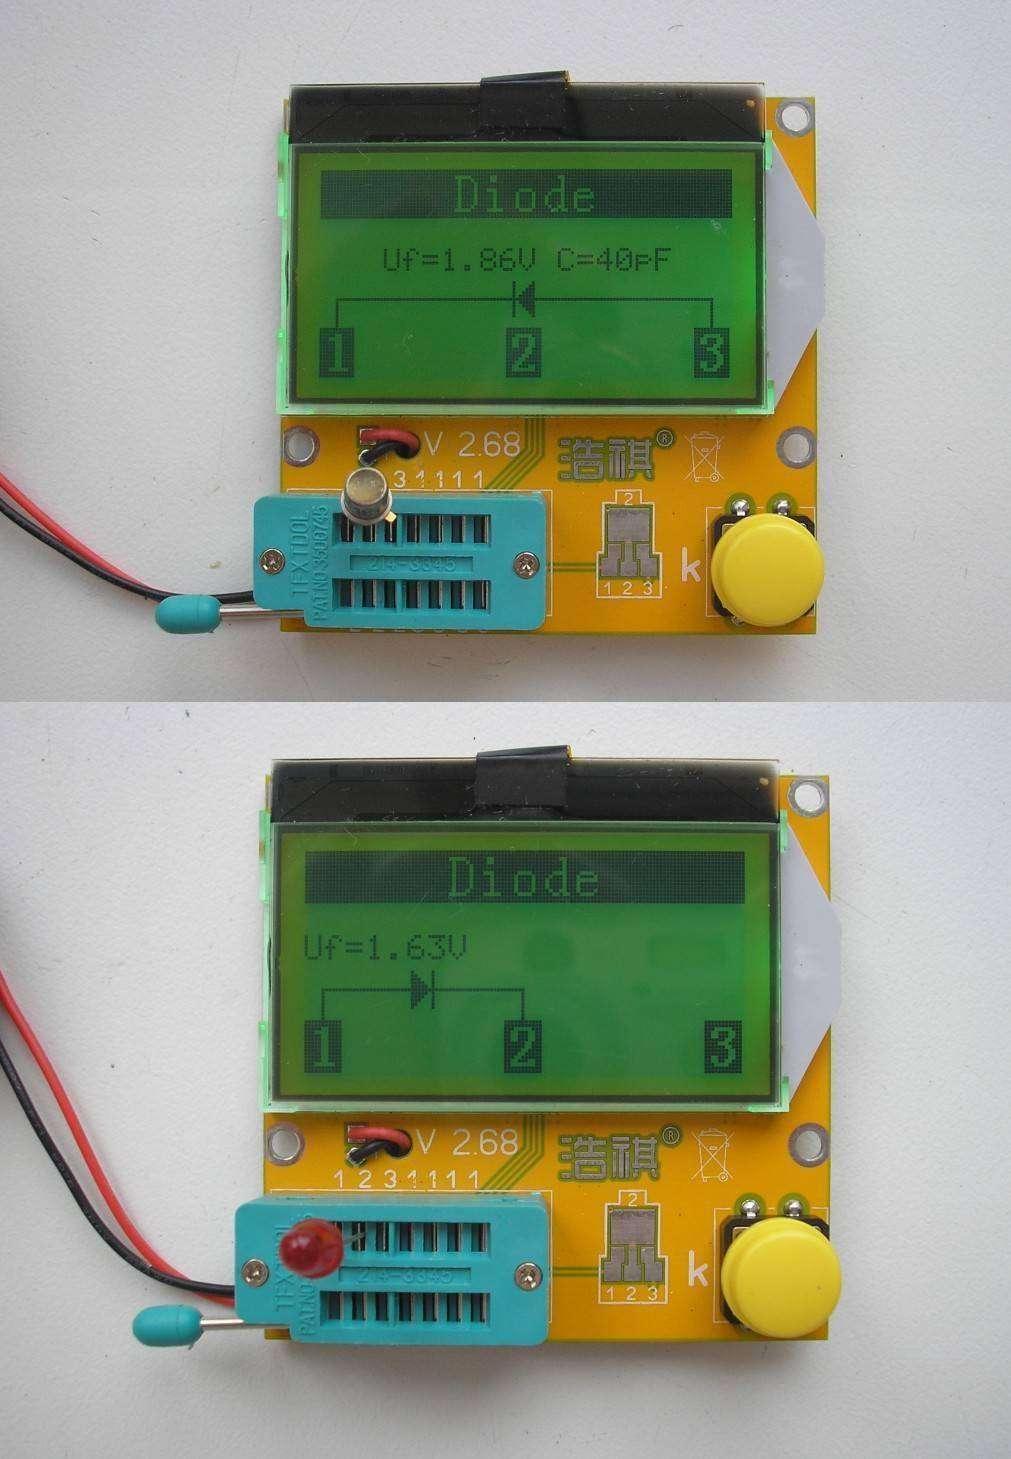 Banggood: LCR-T3 LCD ESR SCR Meter Transistor Tester. Прибор начинающего радиолюбителя